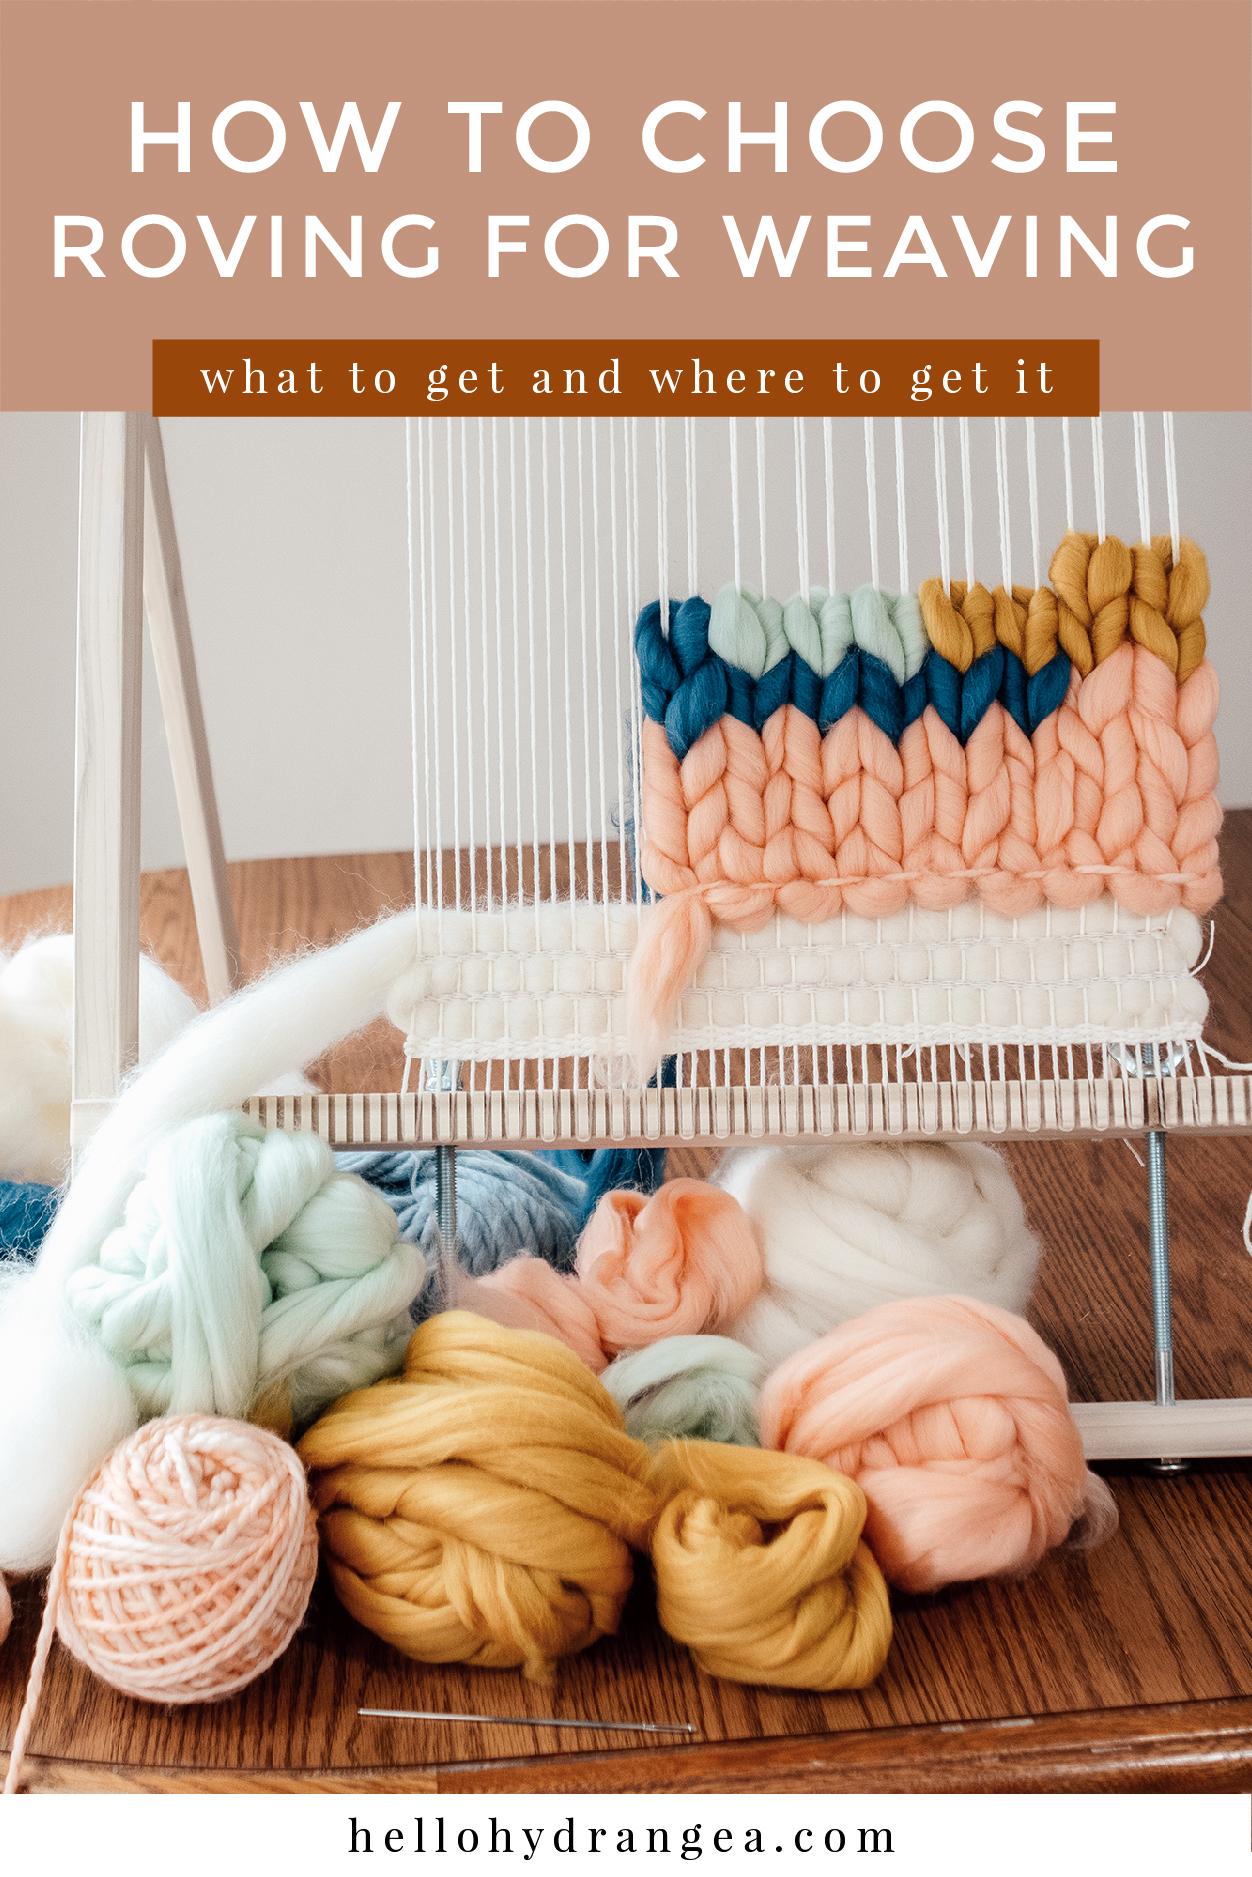 How to choose roving for weaving.jpg